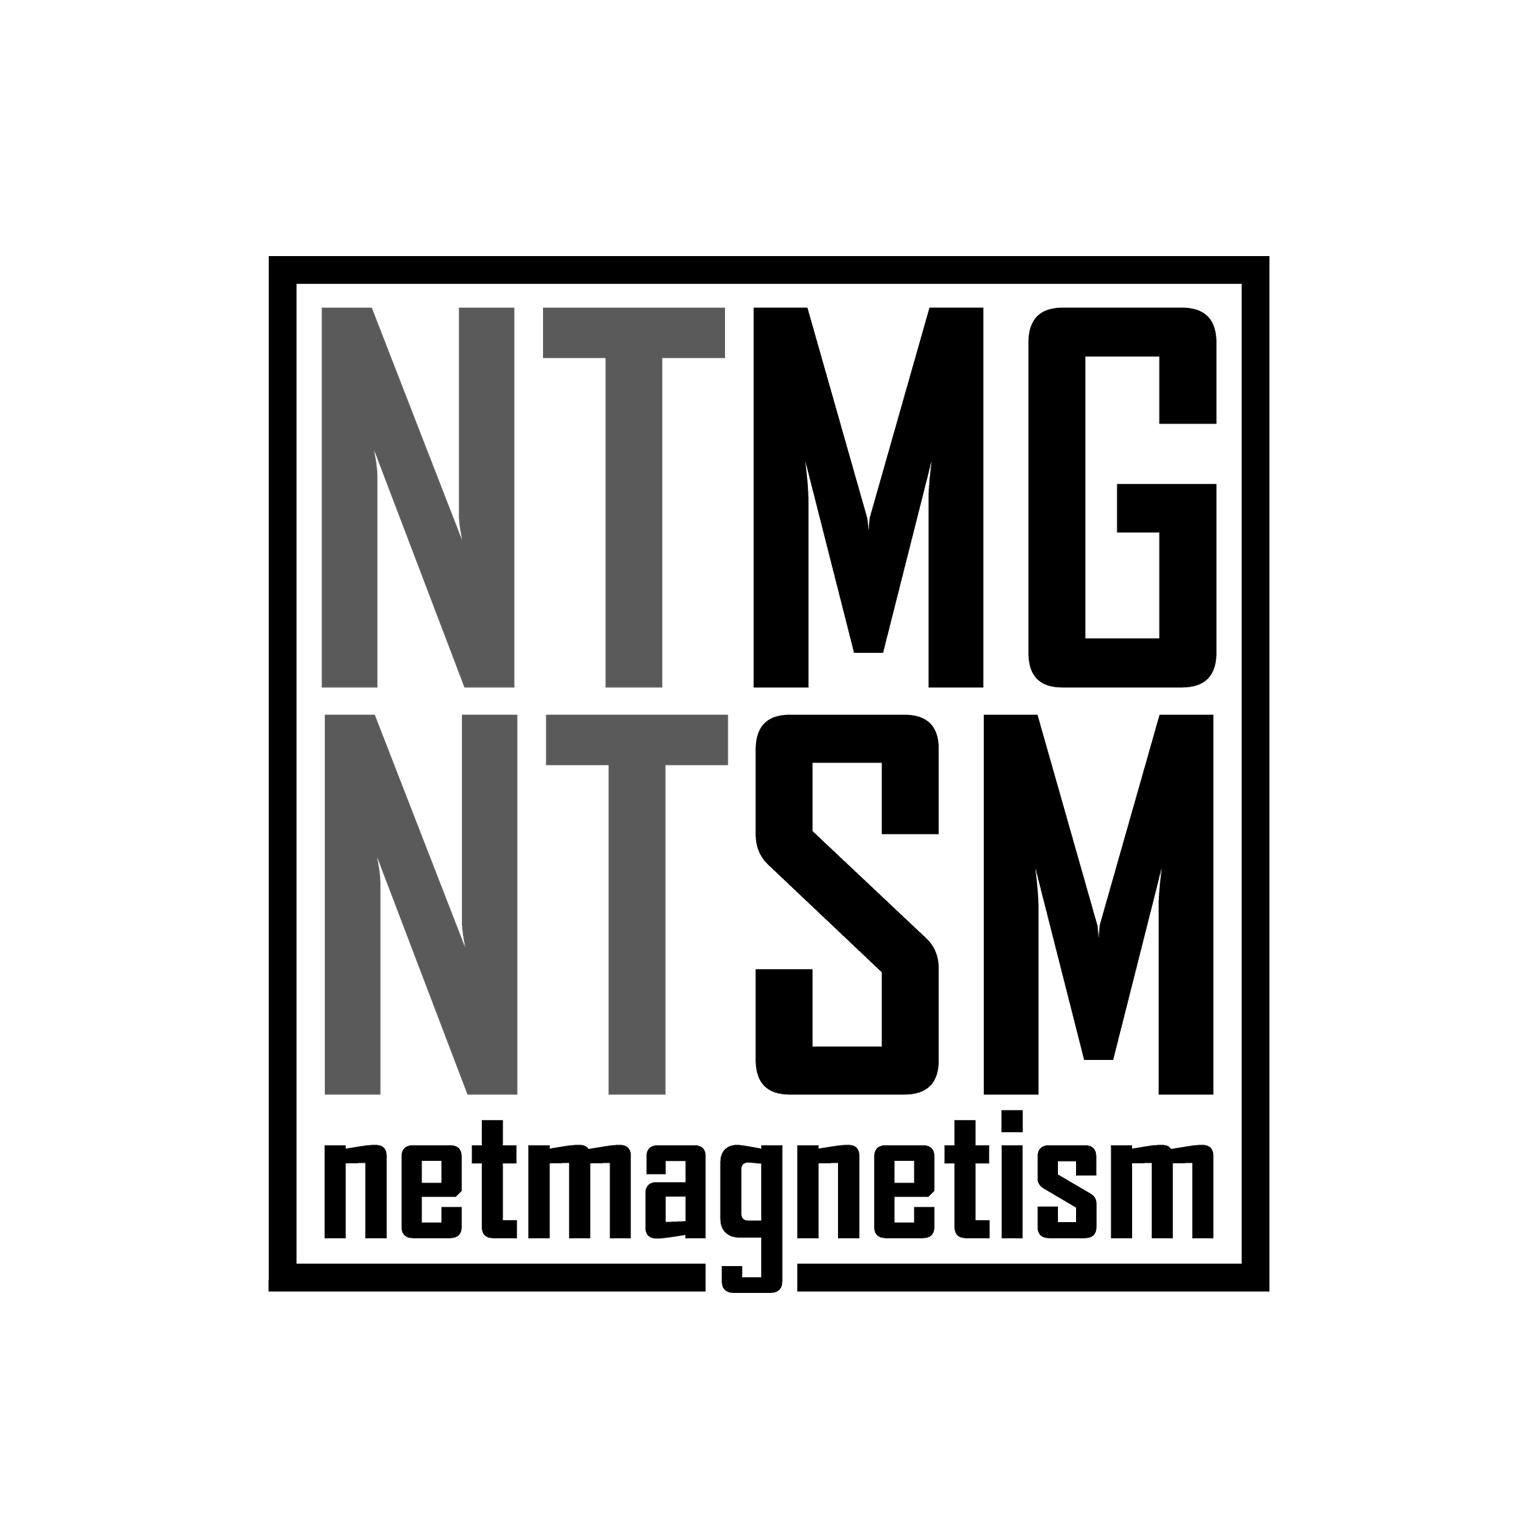 Netmagnetism.jpg